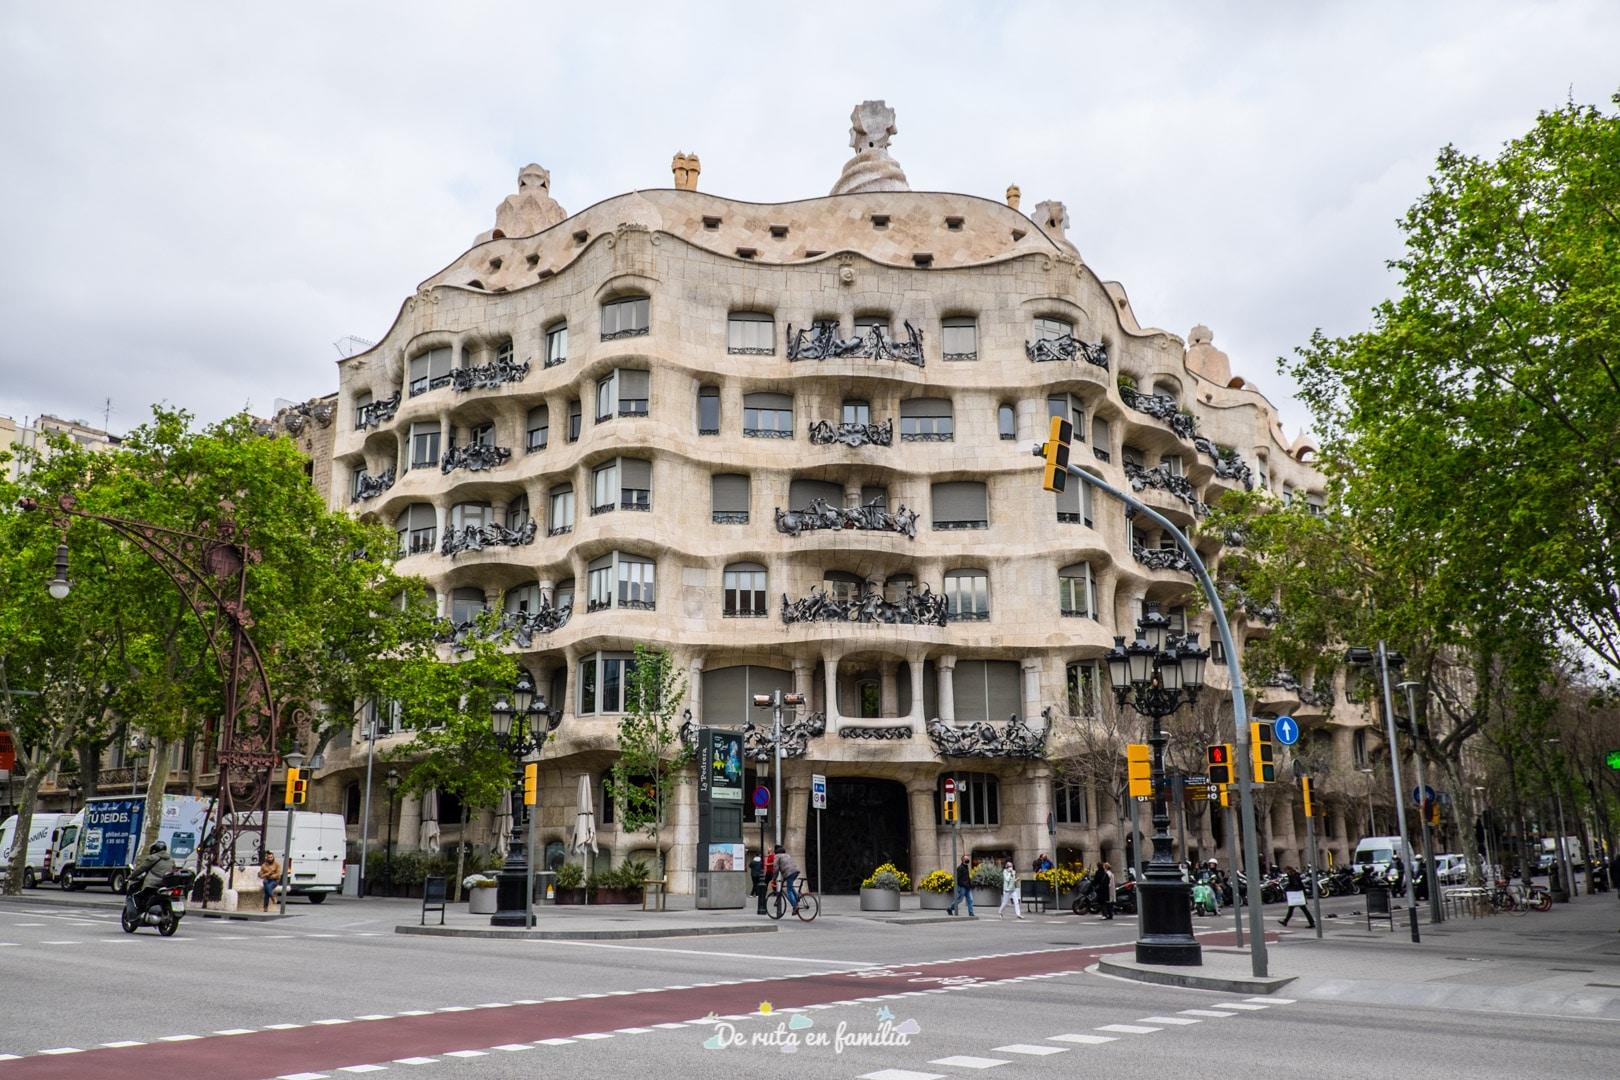 visitar la pedrera barcelona 2021